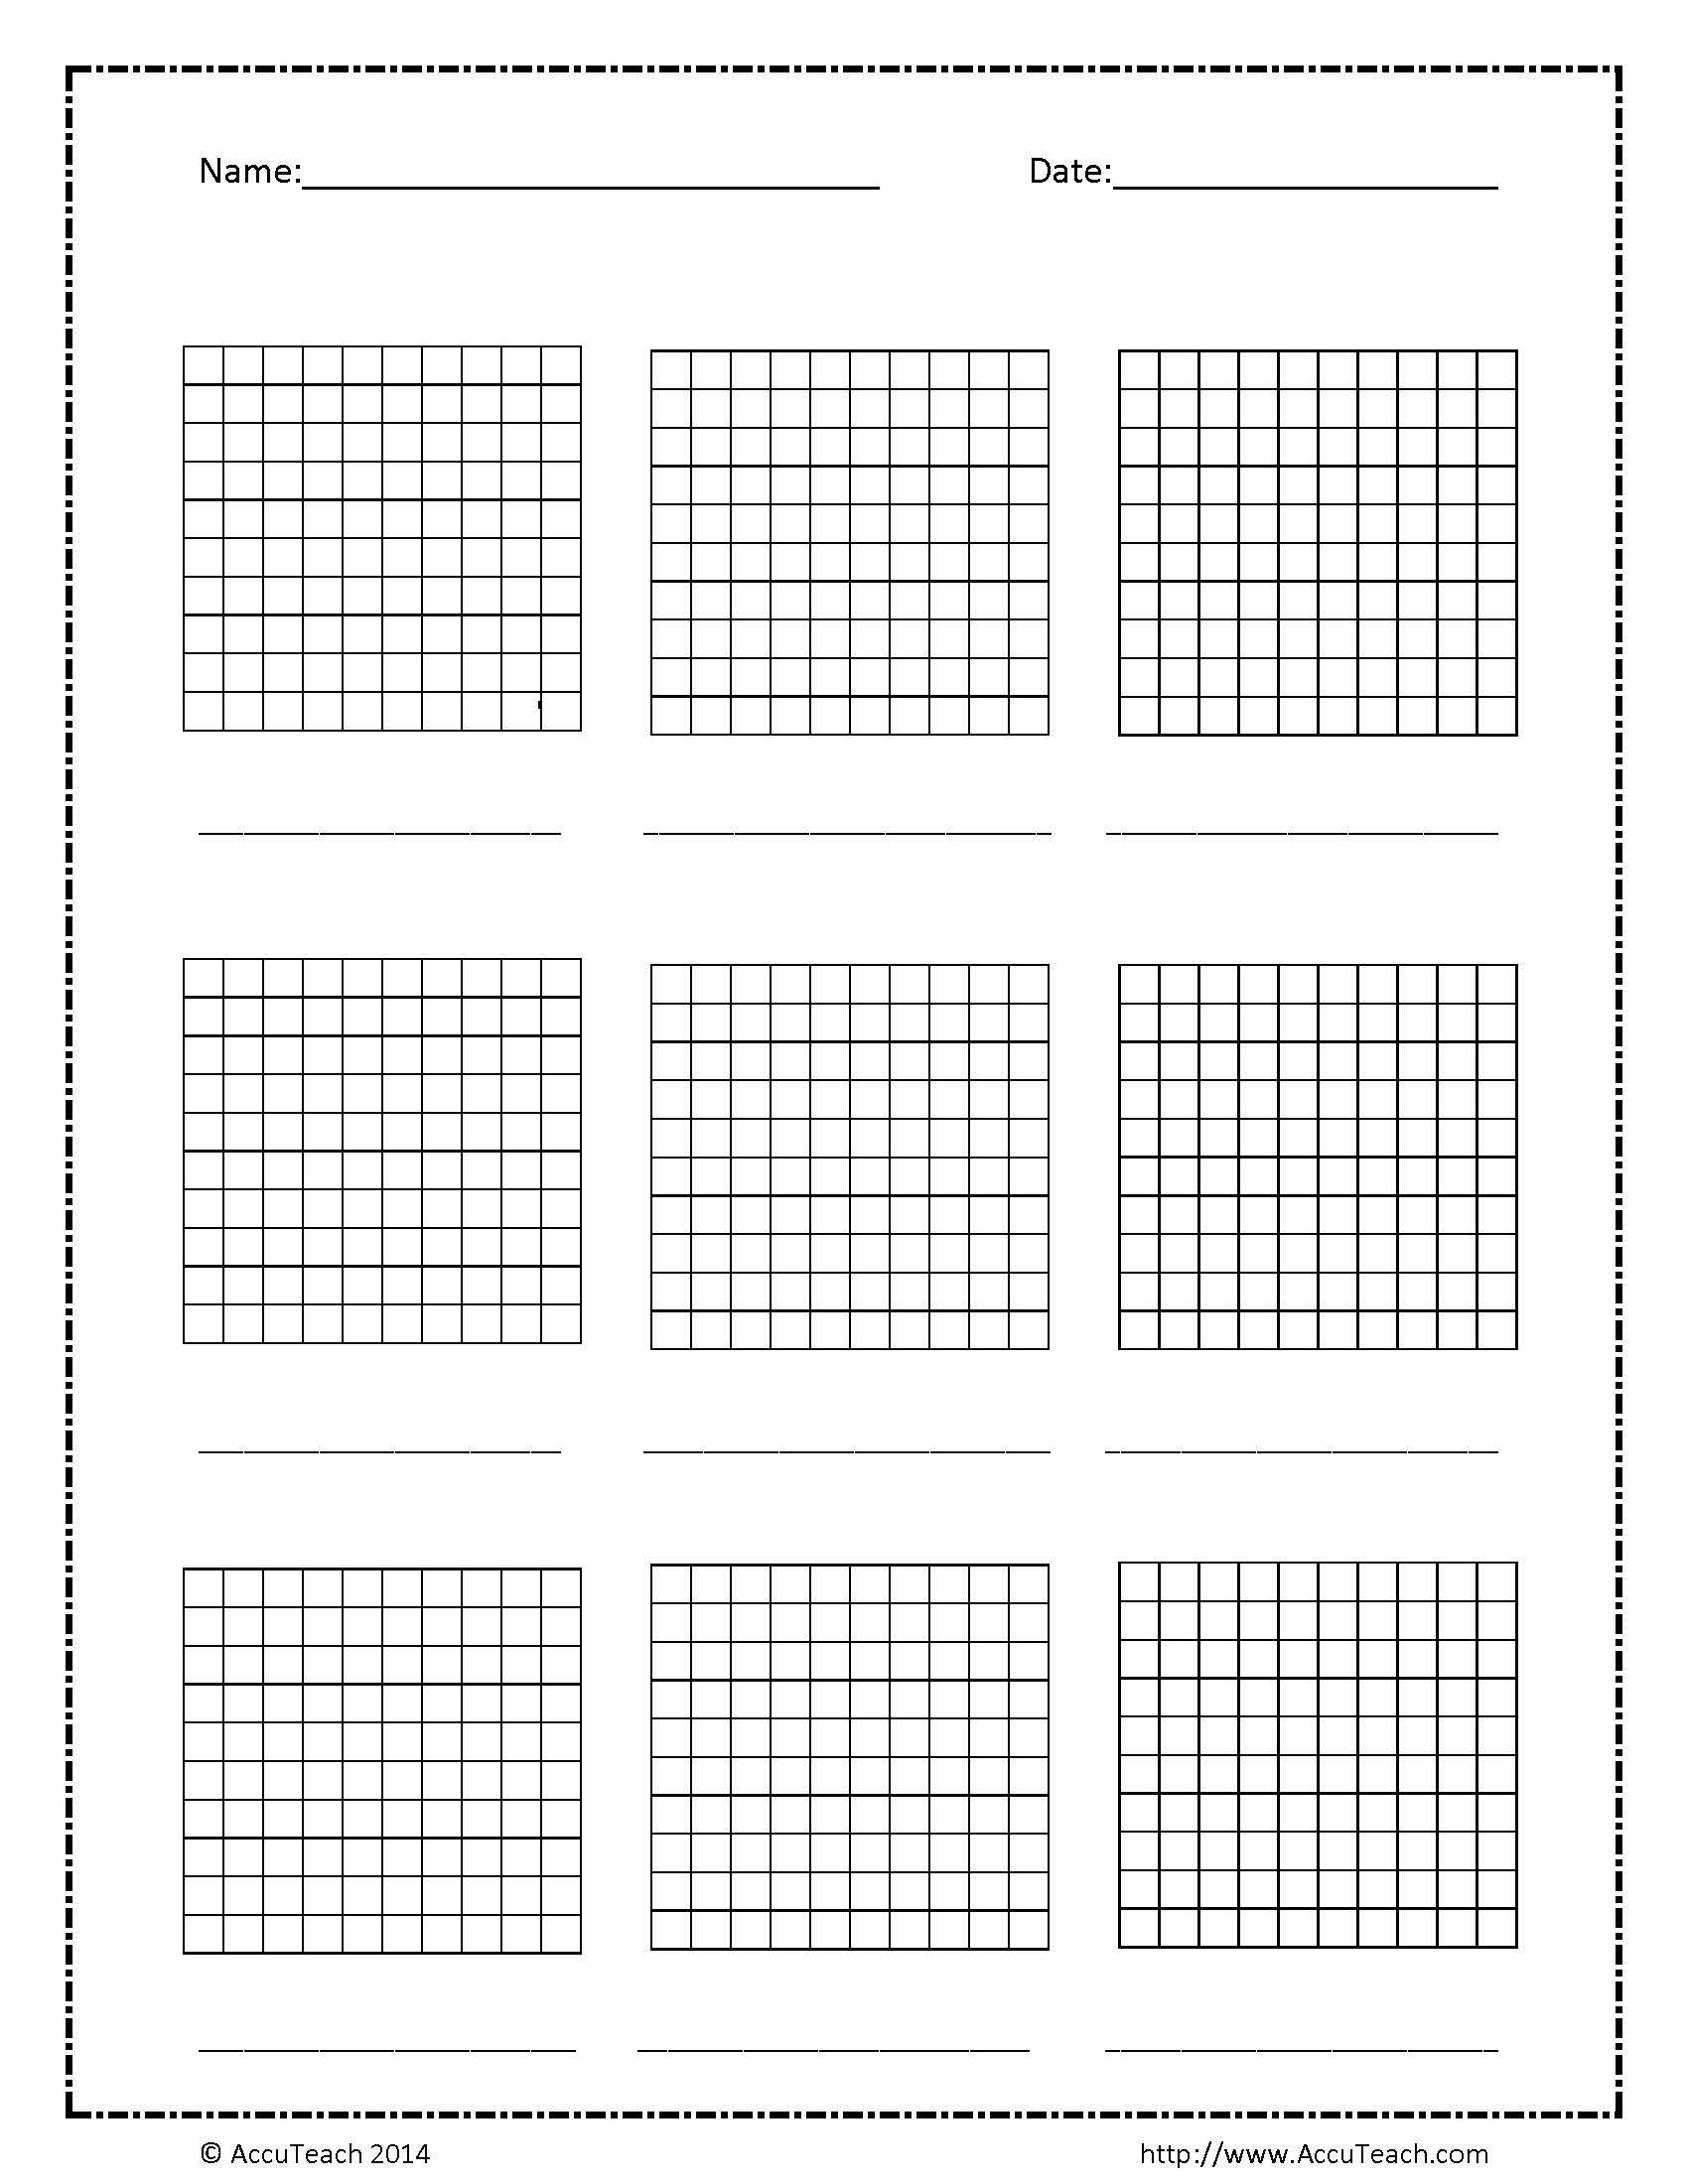 small resolution of Blank Base Ten Hundreds Frame PDF - AccuTeach